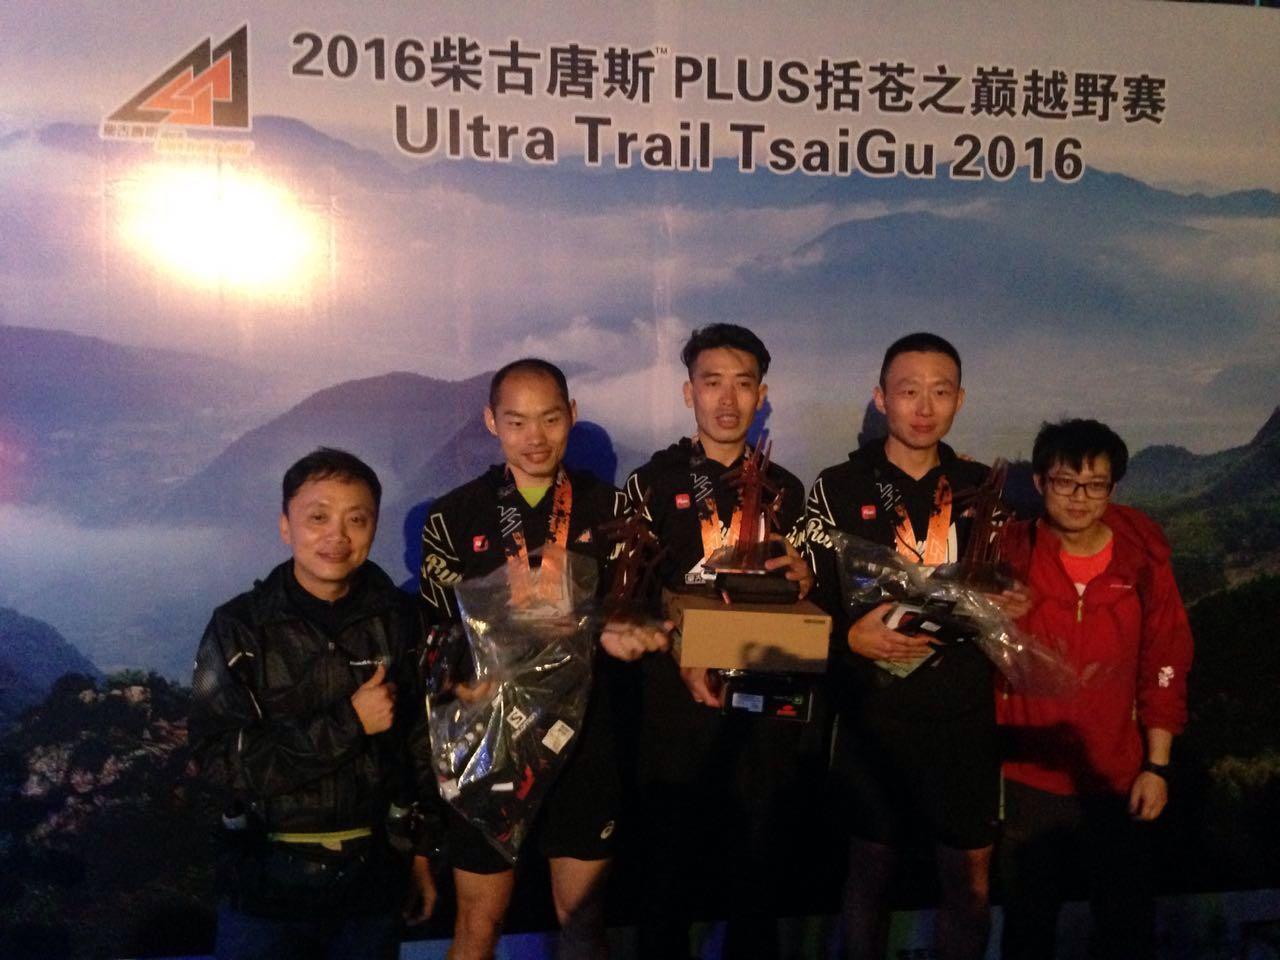 The men's podium of the 2016 Tsaigu Tangsi Plus 50 miles race